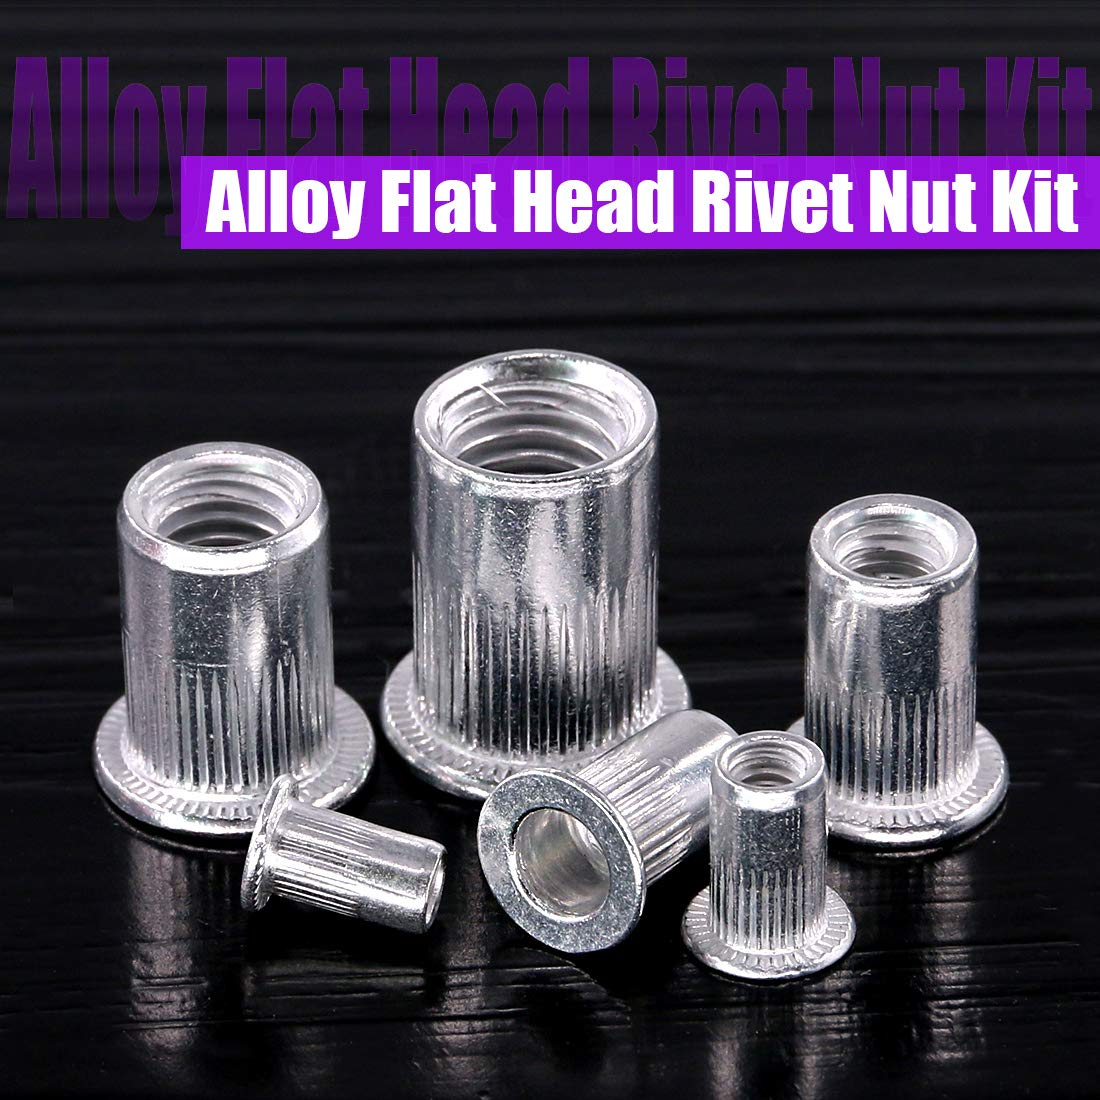 Swpeet 110Pcs Aluminum Alloy Flat Head Rivet Nut Kit, Including Assorted M3 M4 M5 M6 M8 M10 Aluminum Treaded Insert Nutsert Perfect for Providing High Strength Load Bearing Threads by Swpeet (Image #5)